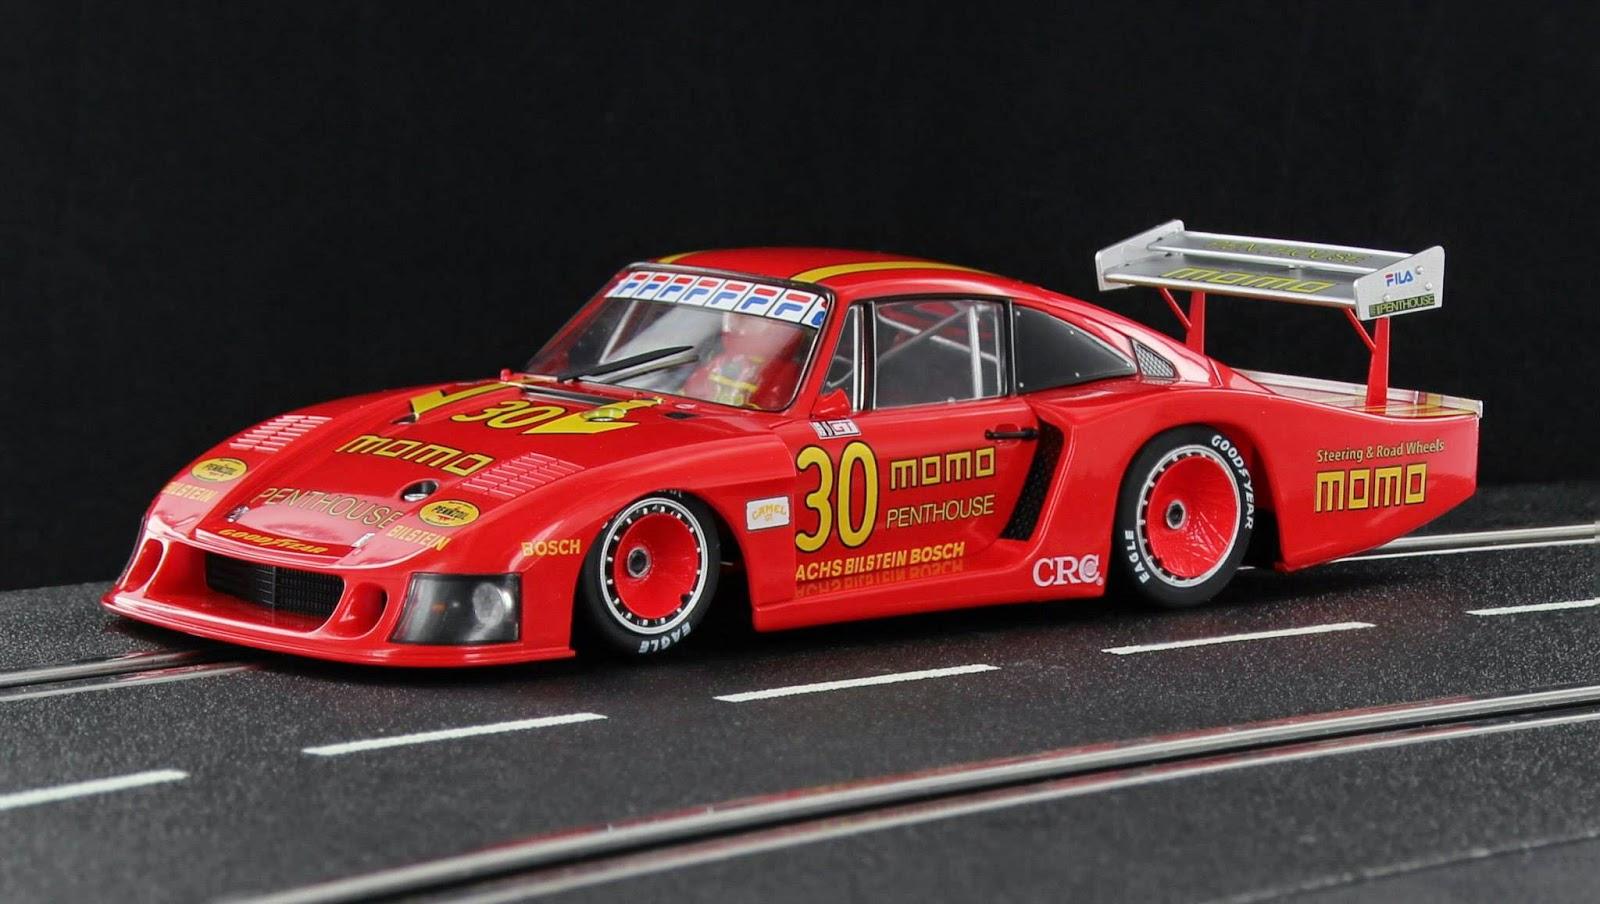 Manicslots Slot Cars And Scenery News Sideways Porsche 935 78